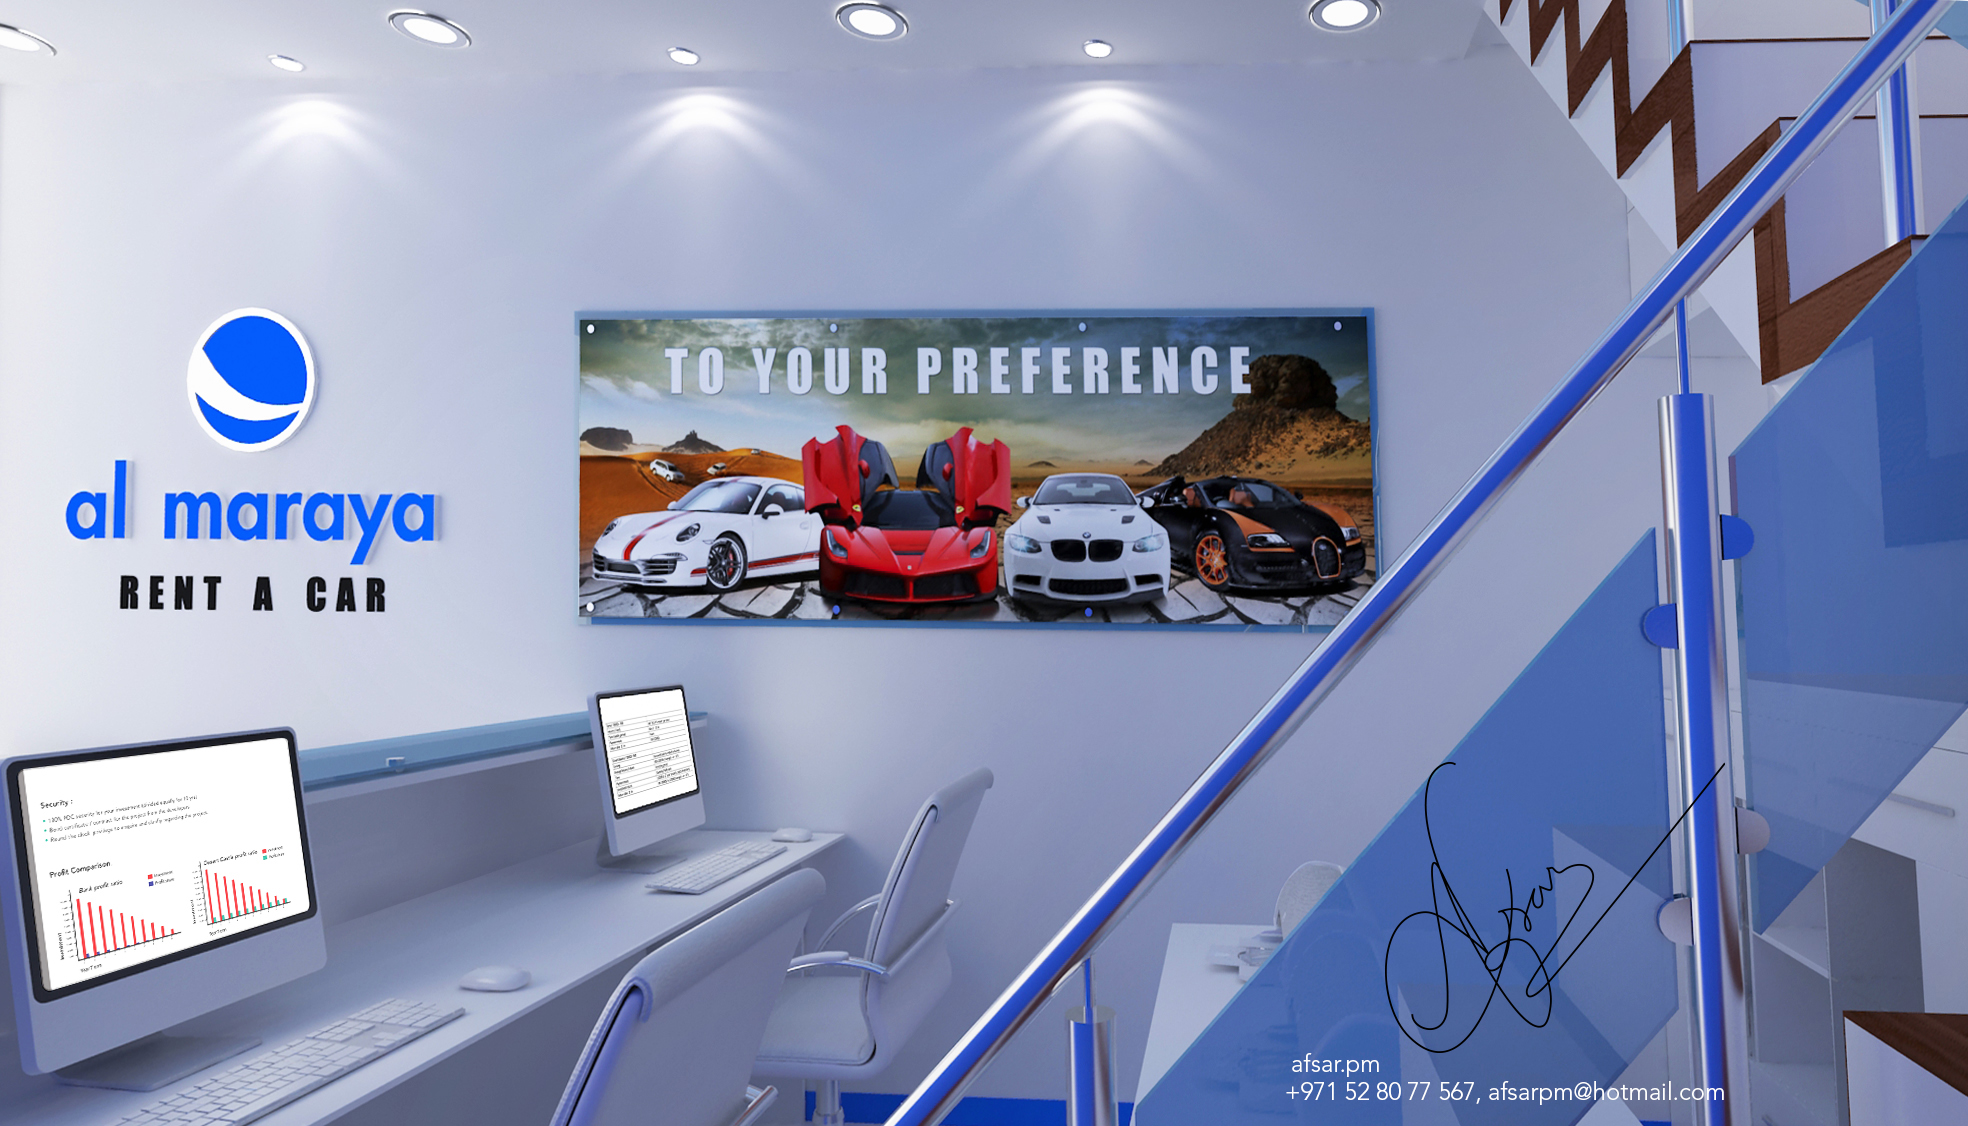 Exhibition Stand For Rent Dubai : Al manara rent a car by afsar p m at coroflot